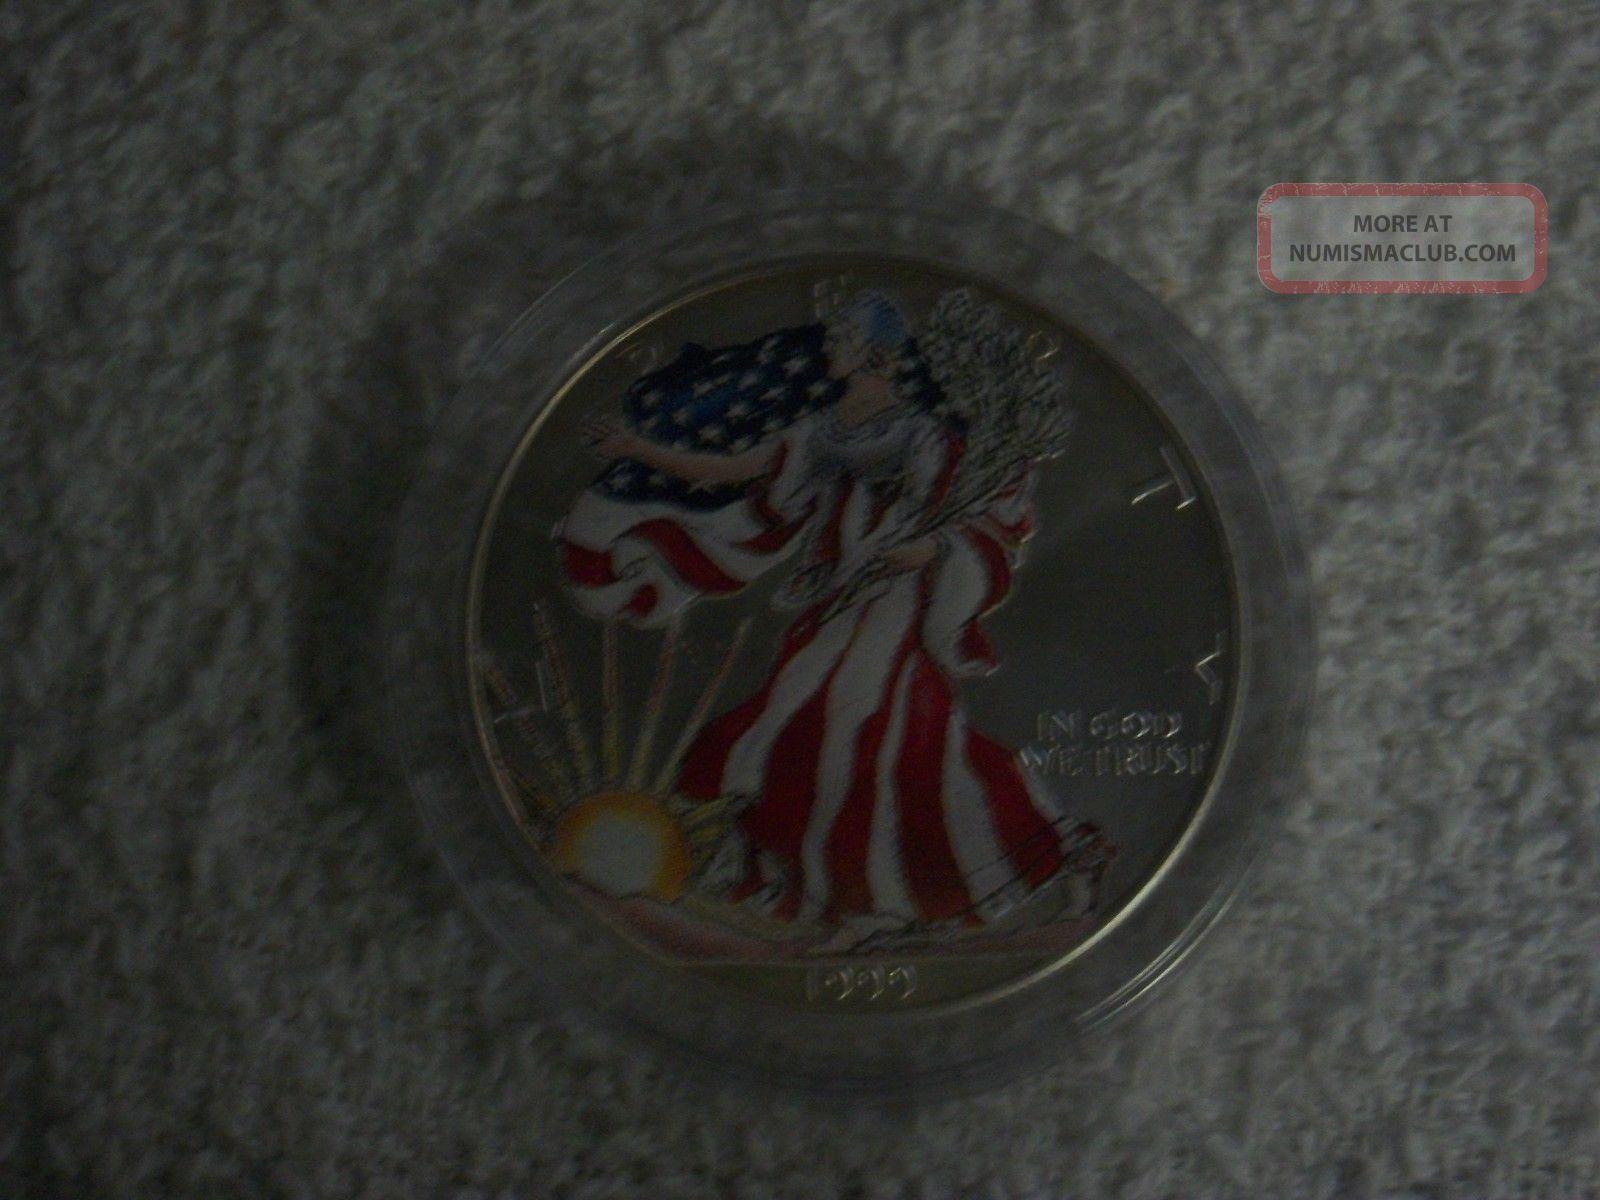 1999 American Eagle Silver Dollar 1oz Fine Silver - Lady Liberty Full Color Silver photo